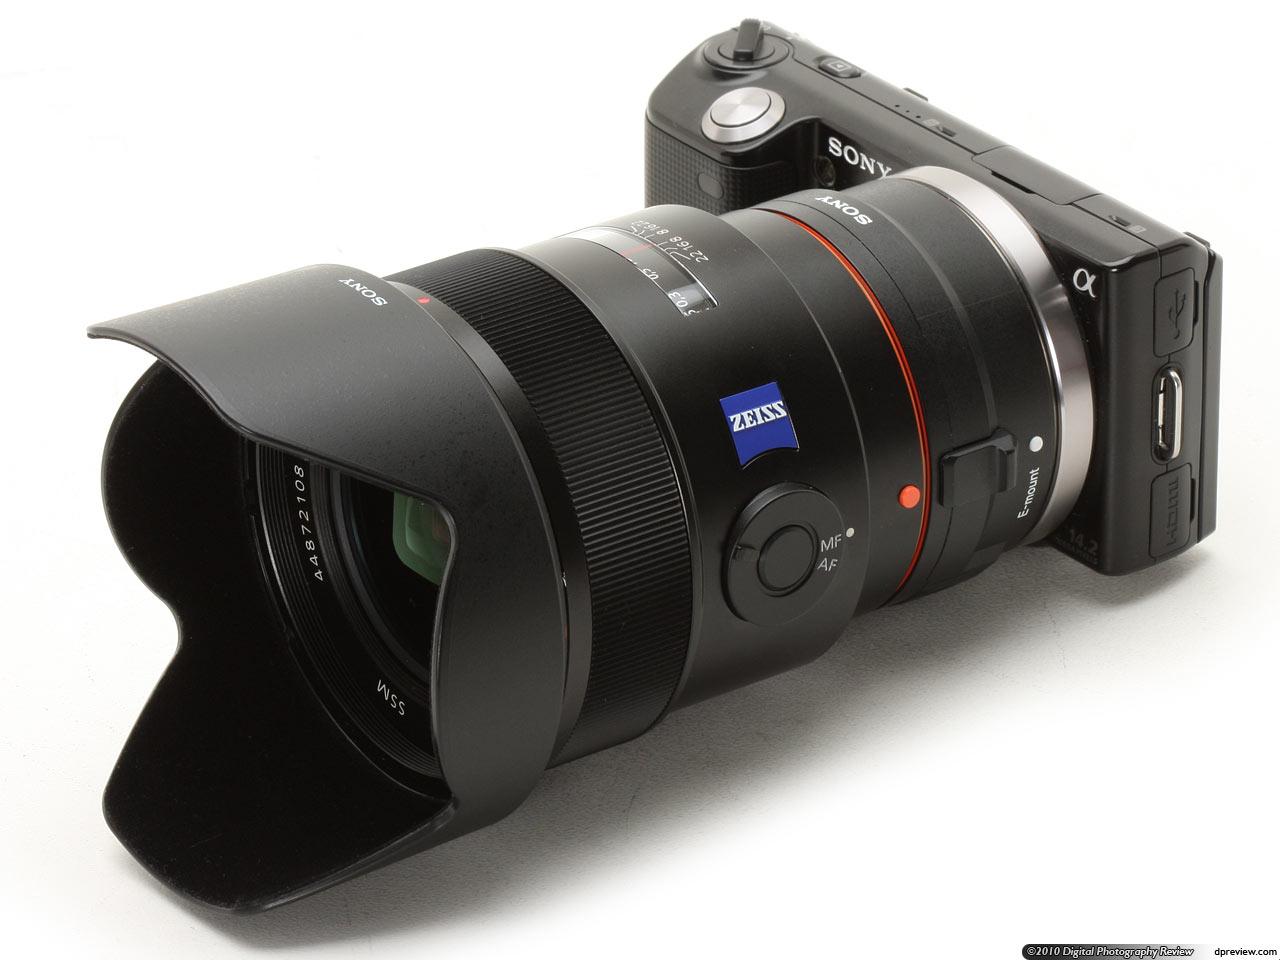 http://1.bp.blogspot.com/_8GhZXWLEN6M/TE7yeA604iI/AAAAAAAAA_Y/fshq1U3B1Co/s1600/sony-nex-zeiss-24mm.jpg